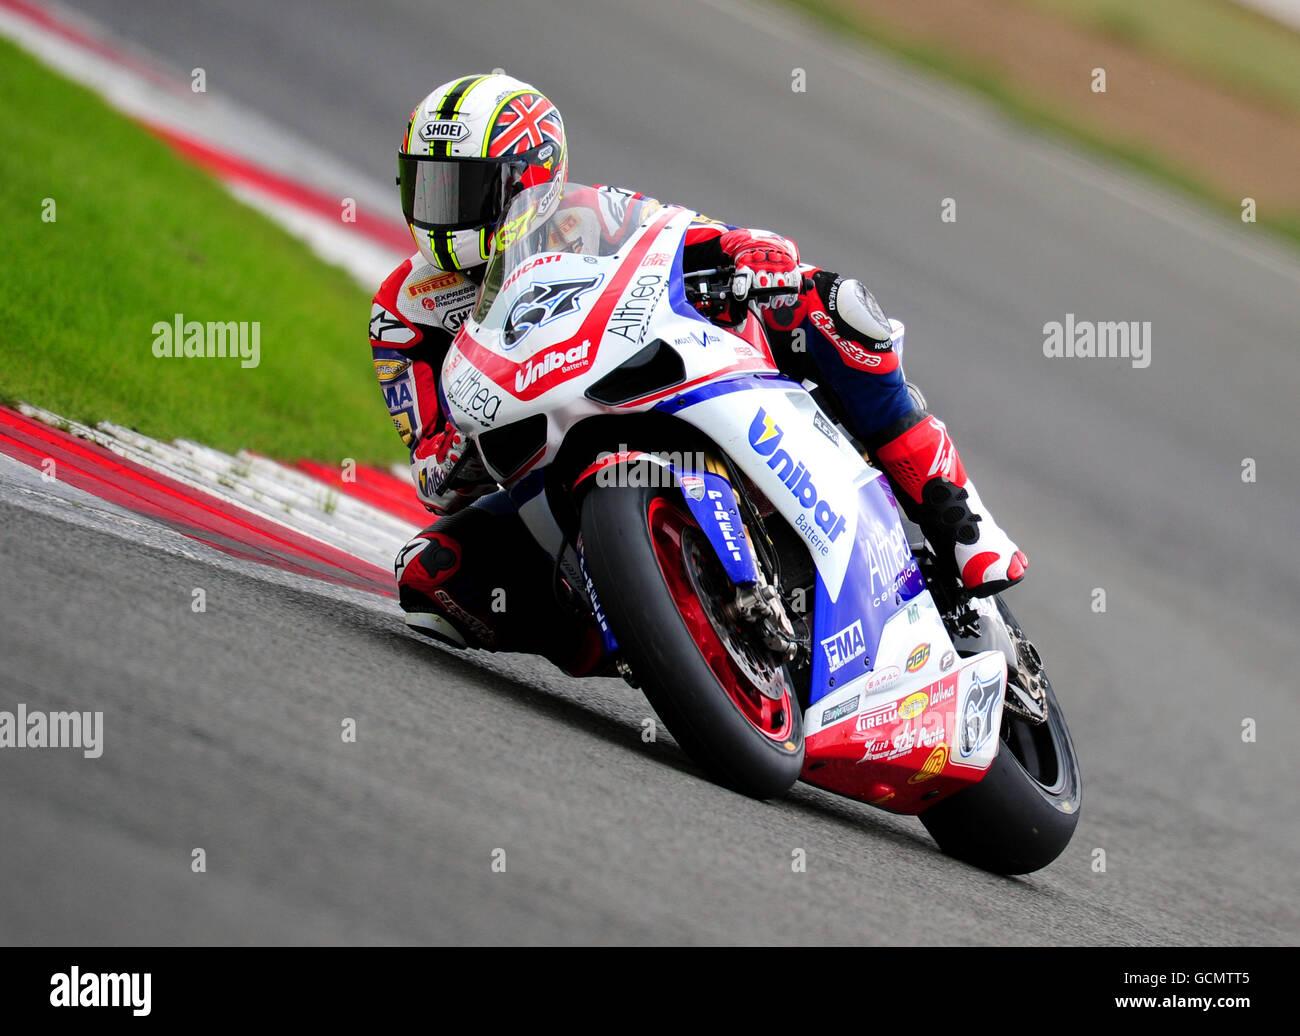 Moto Racing - World Super Bikes - British Grand Prix - Qualifying - Silverstone Stock Photo